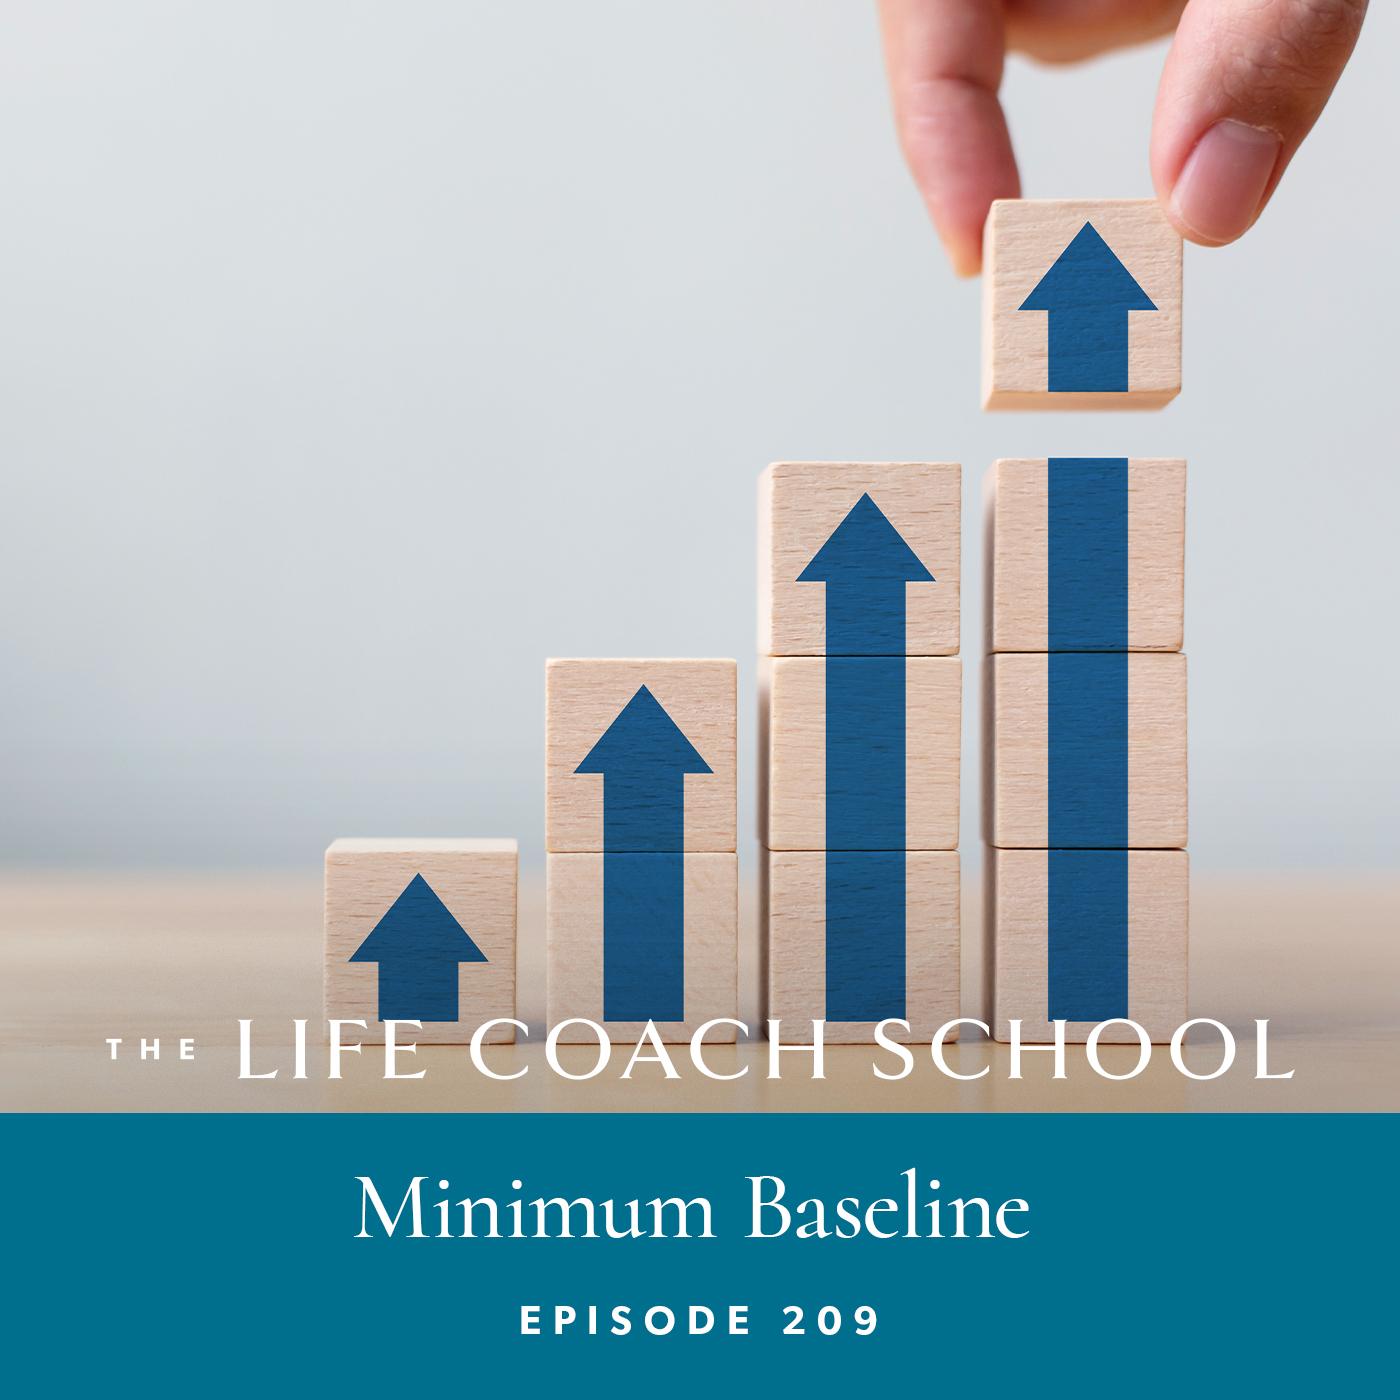 The Life Coach School Podcast with Brooke Castillo | Episode 209 | Minimum Baseline